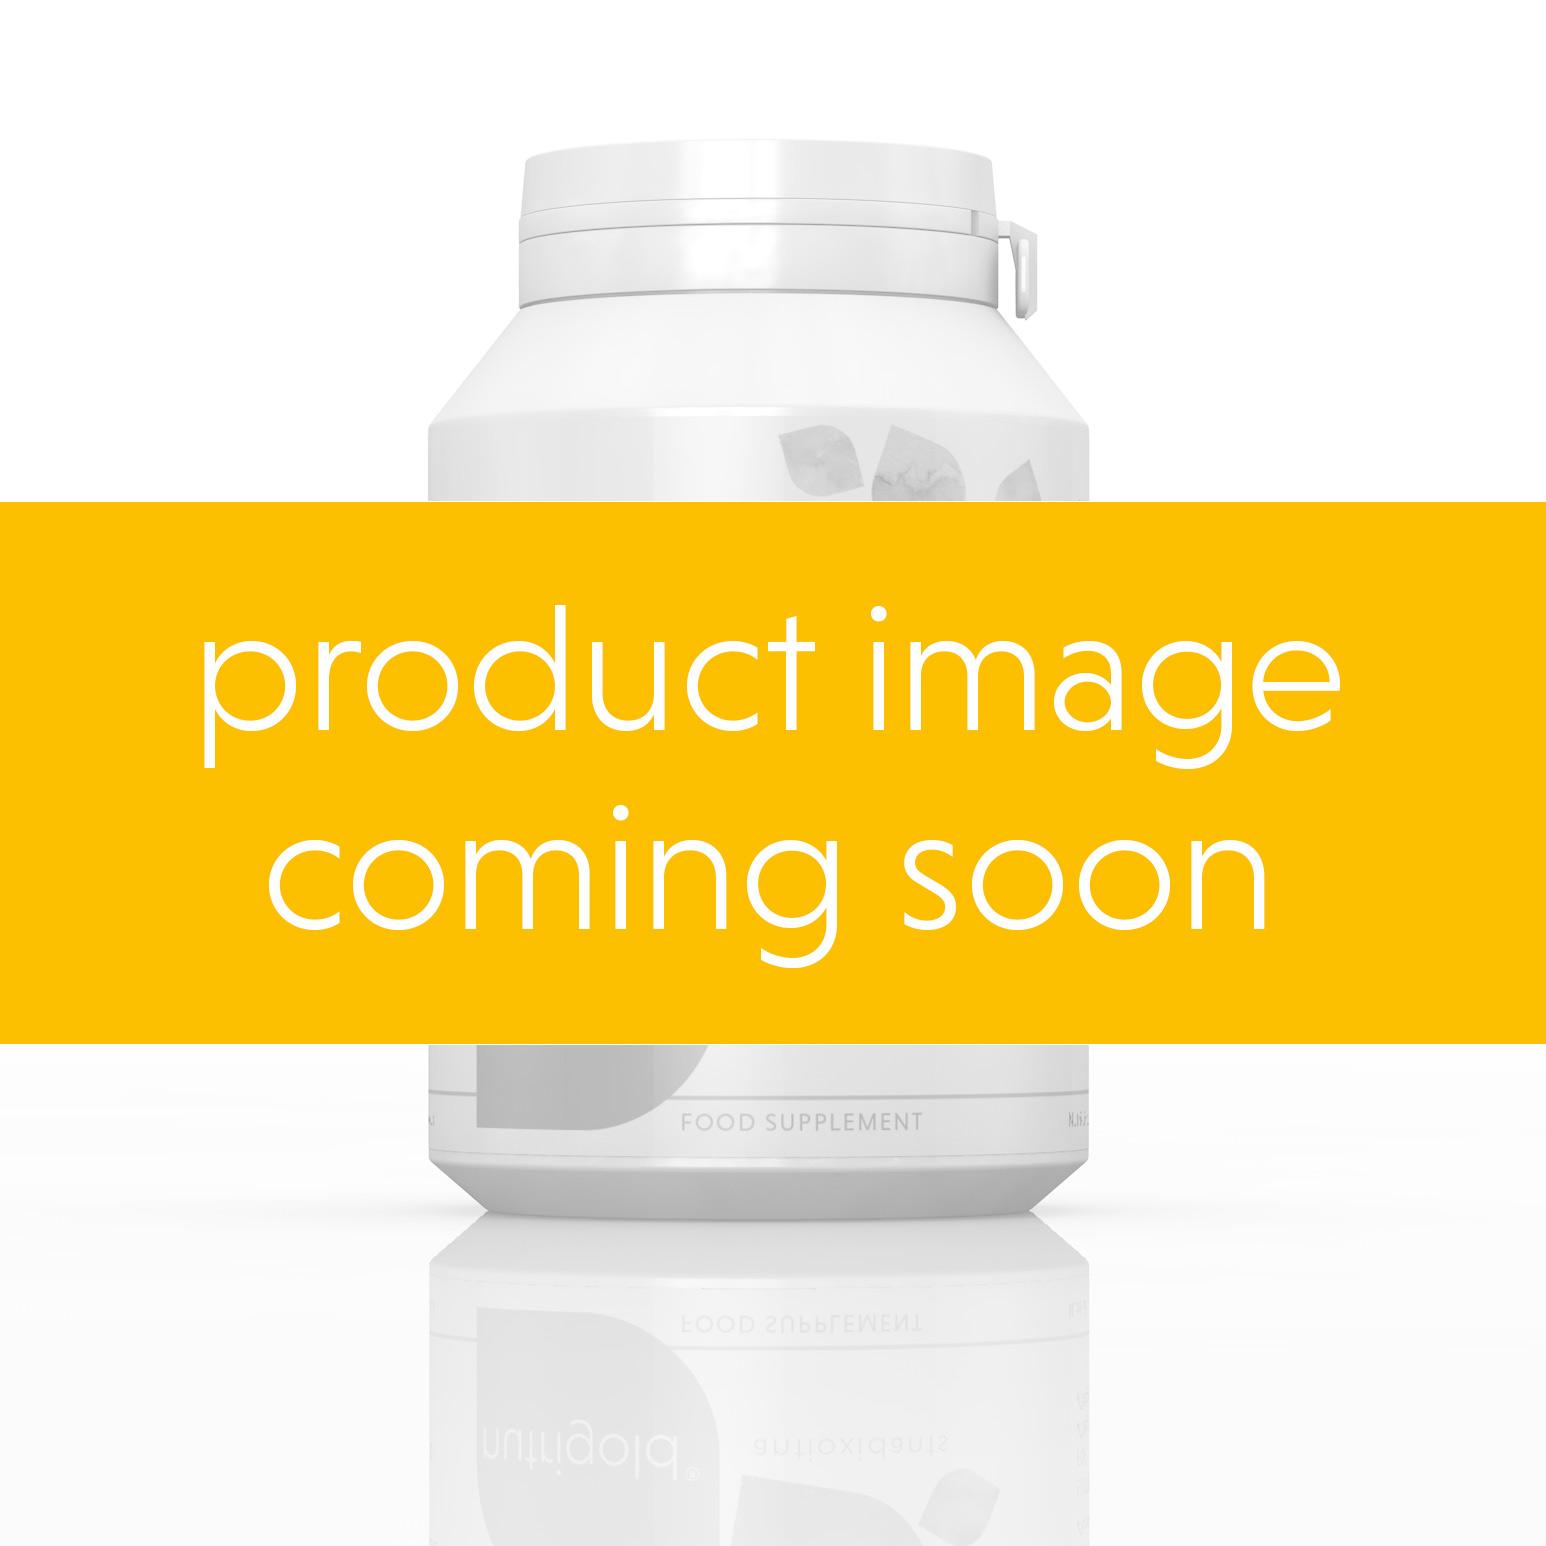 Detox Nutritional Support Programme